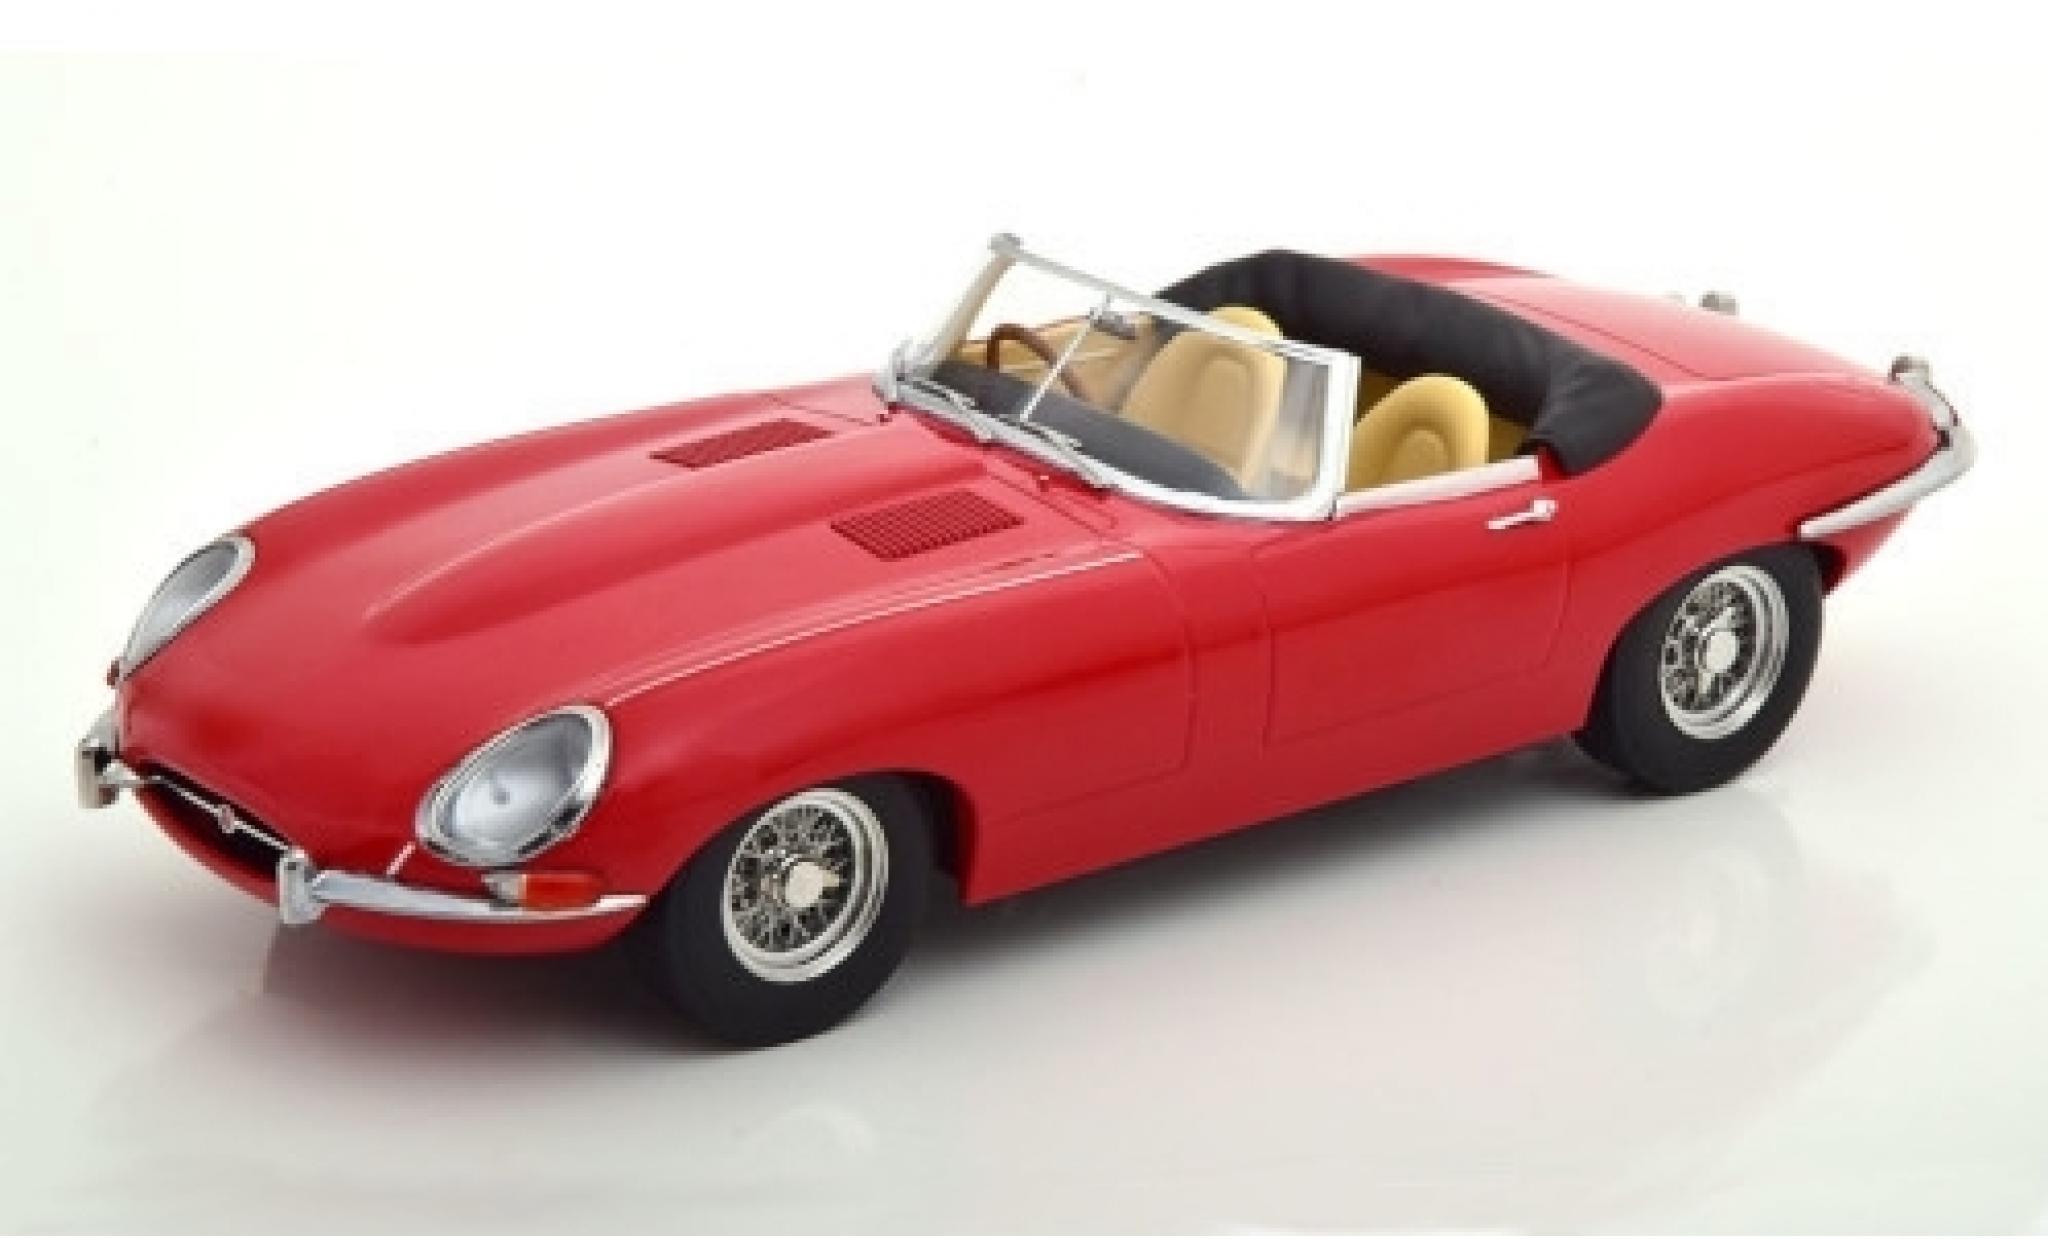 Jaguar E-Type 1/18 KK Scale Series I Roadster rouge RHD 1961 Verdeck ouvert